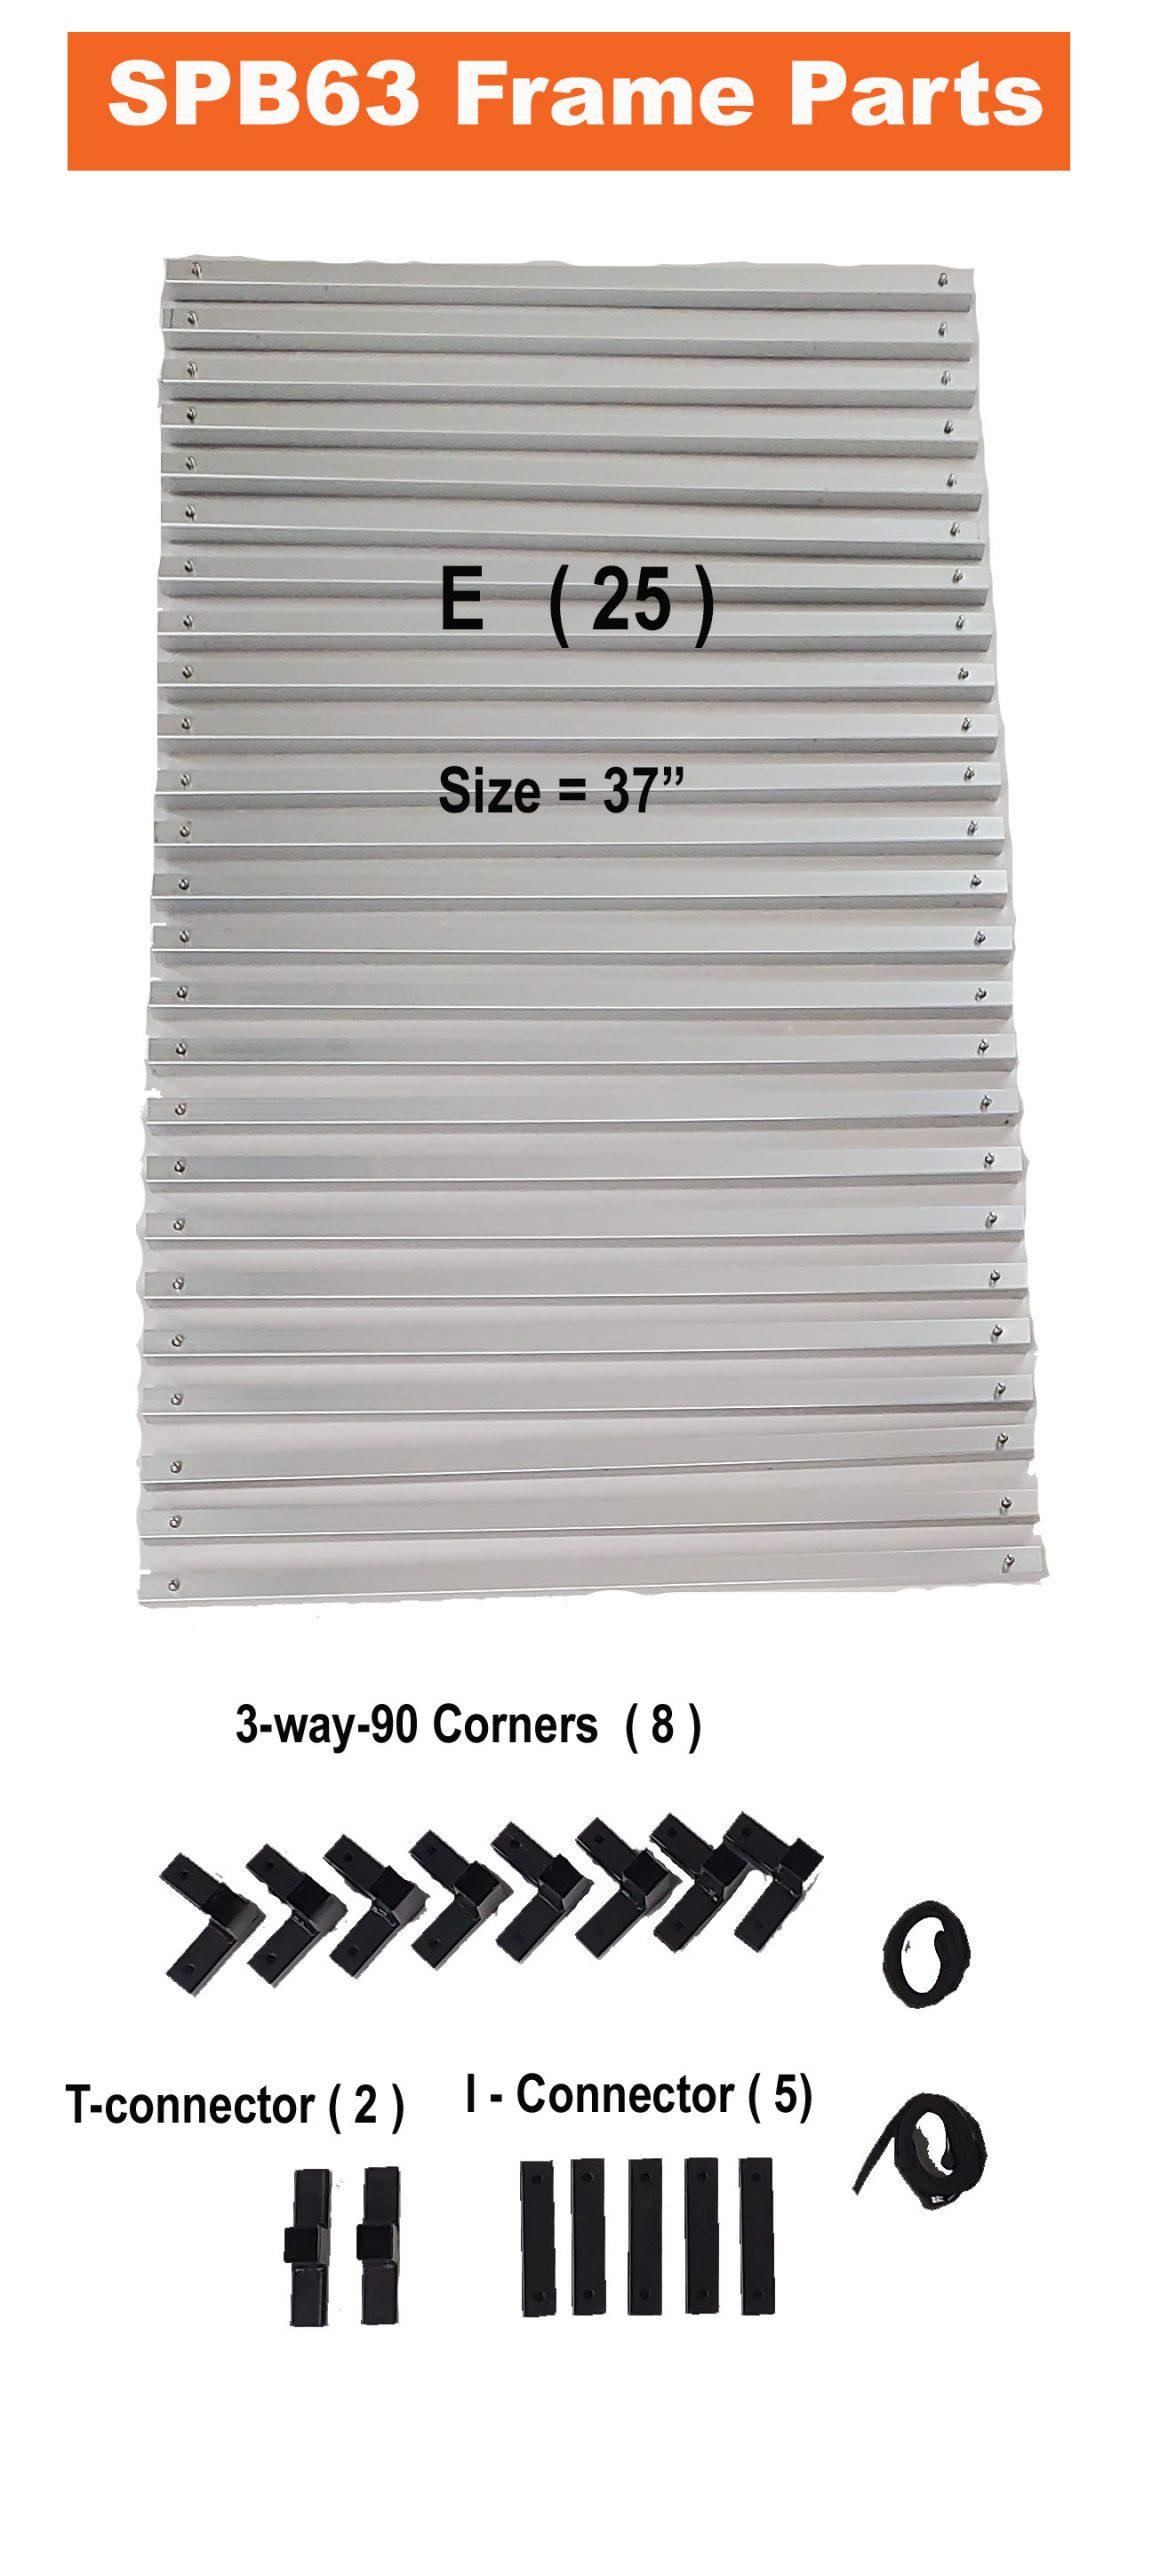 SPB63 -frame parts